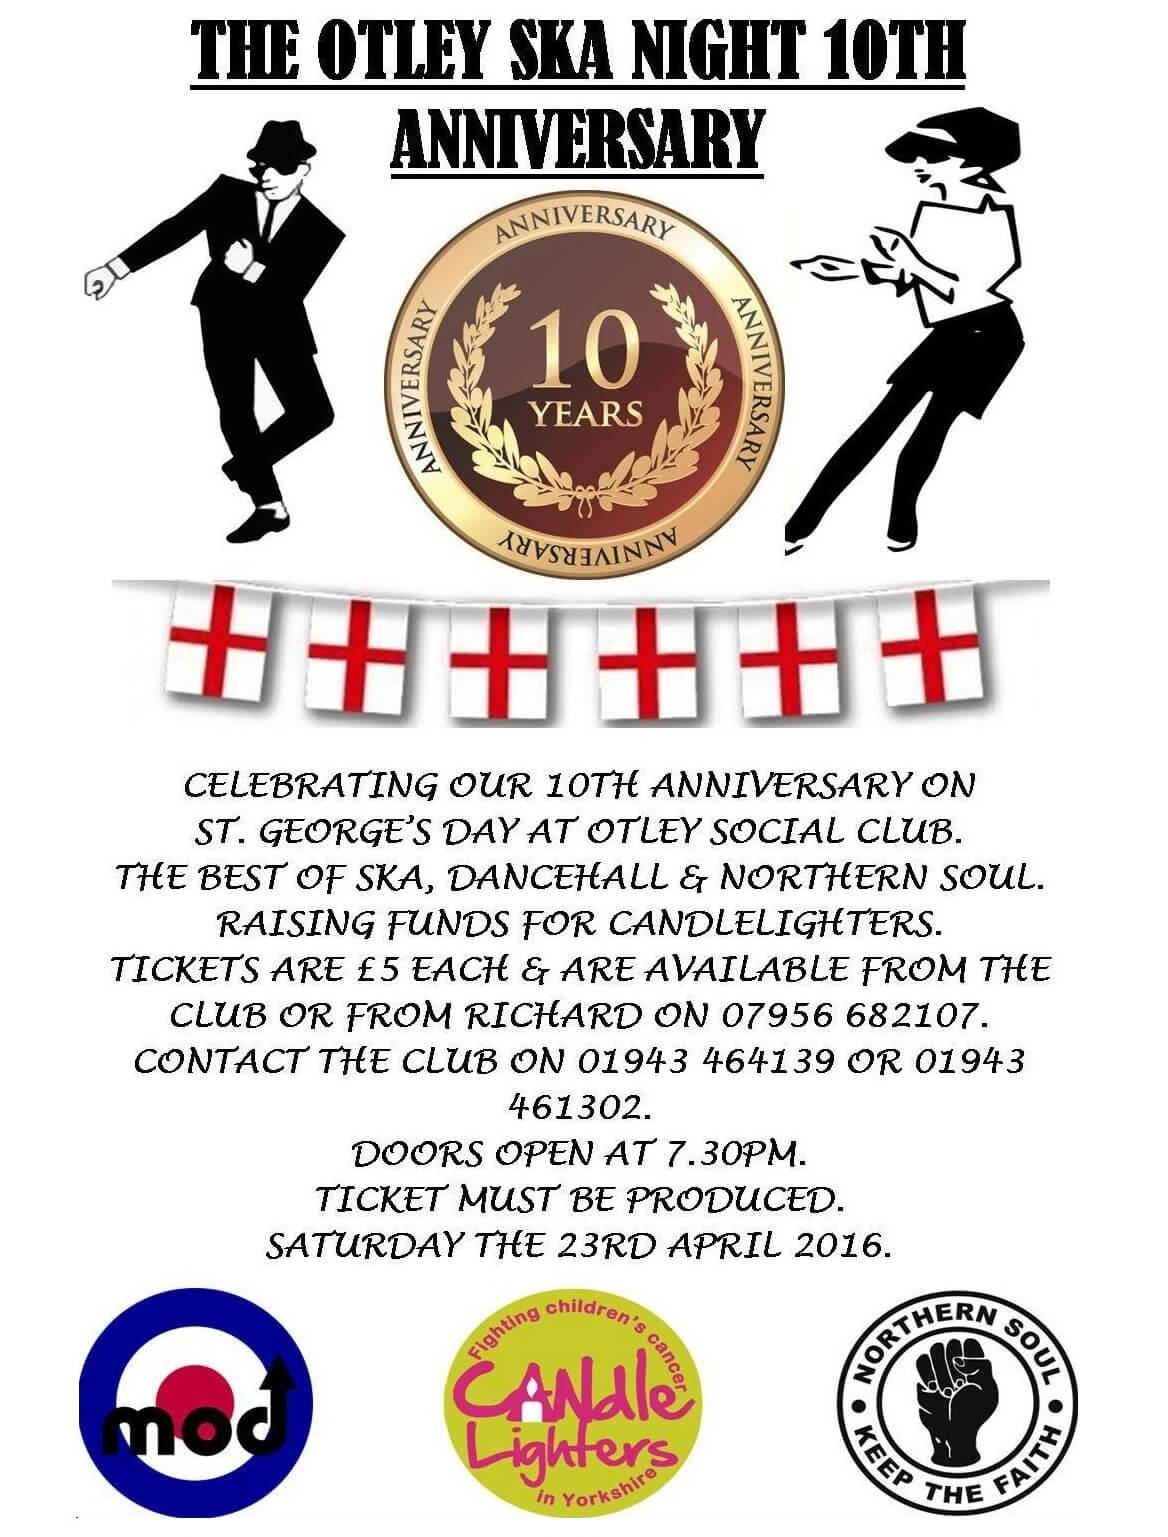 The Otley Ska Night 10th Anniversary